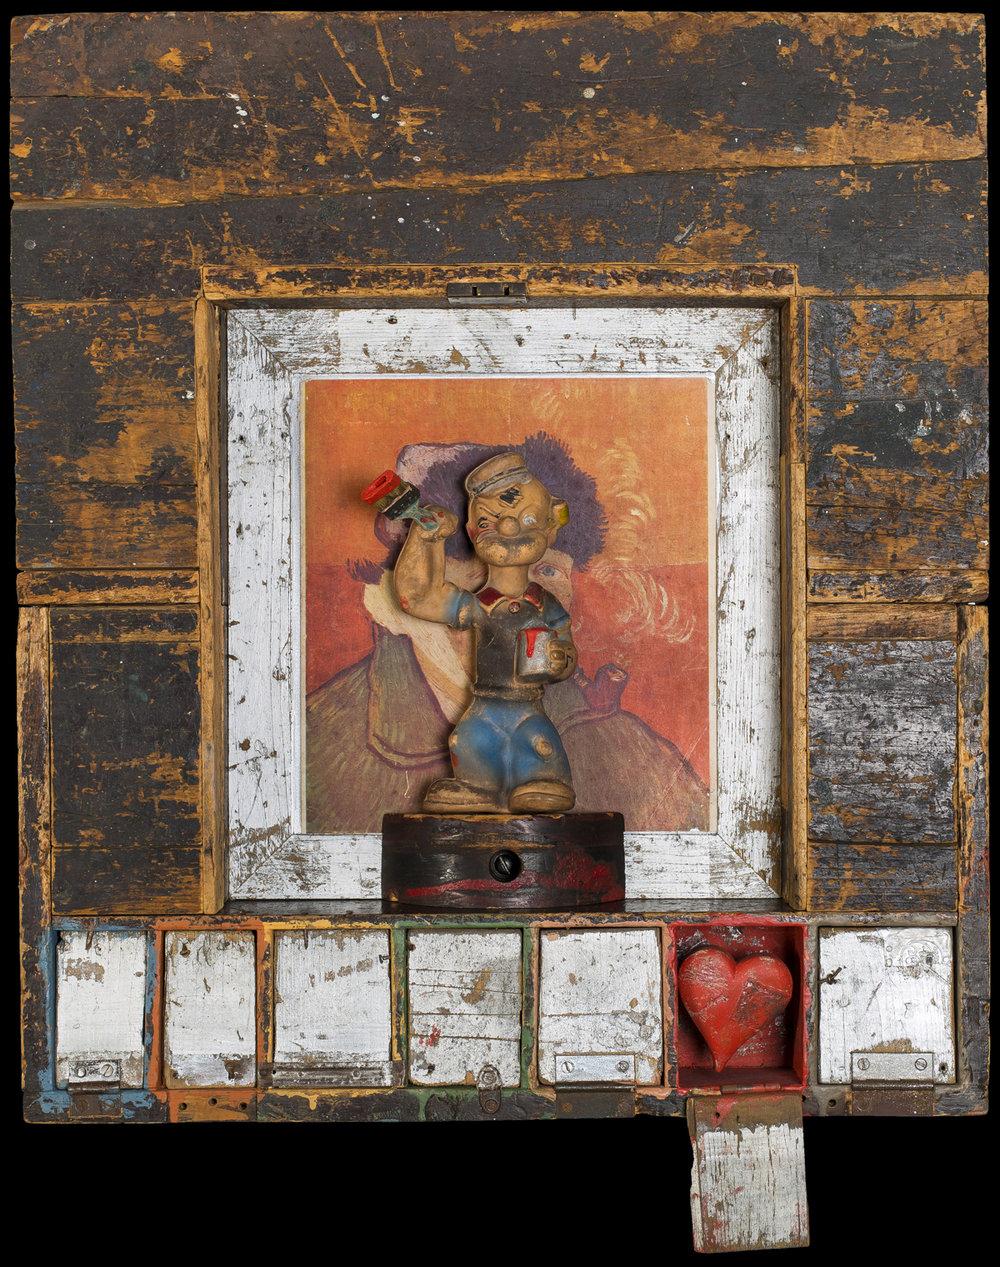 Me & Vince, 2013, 28x24x5 (Sold)